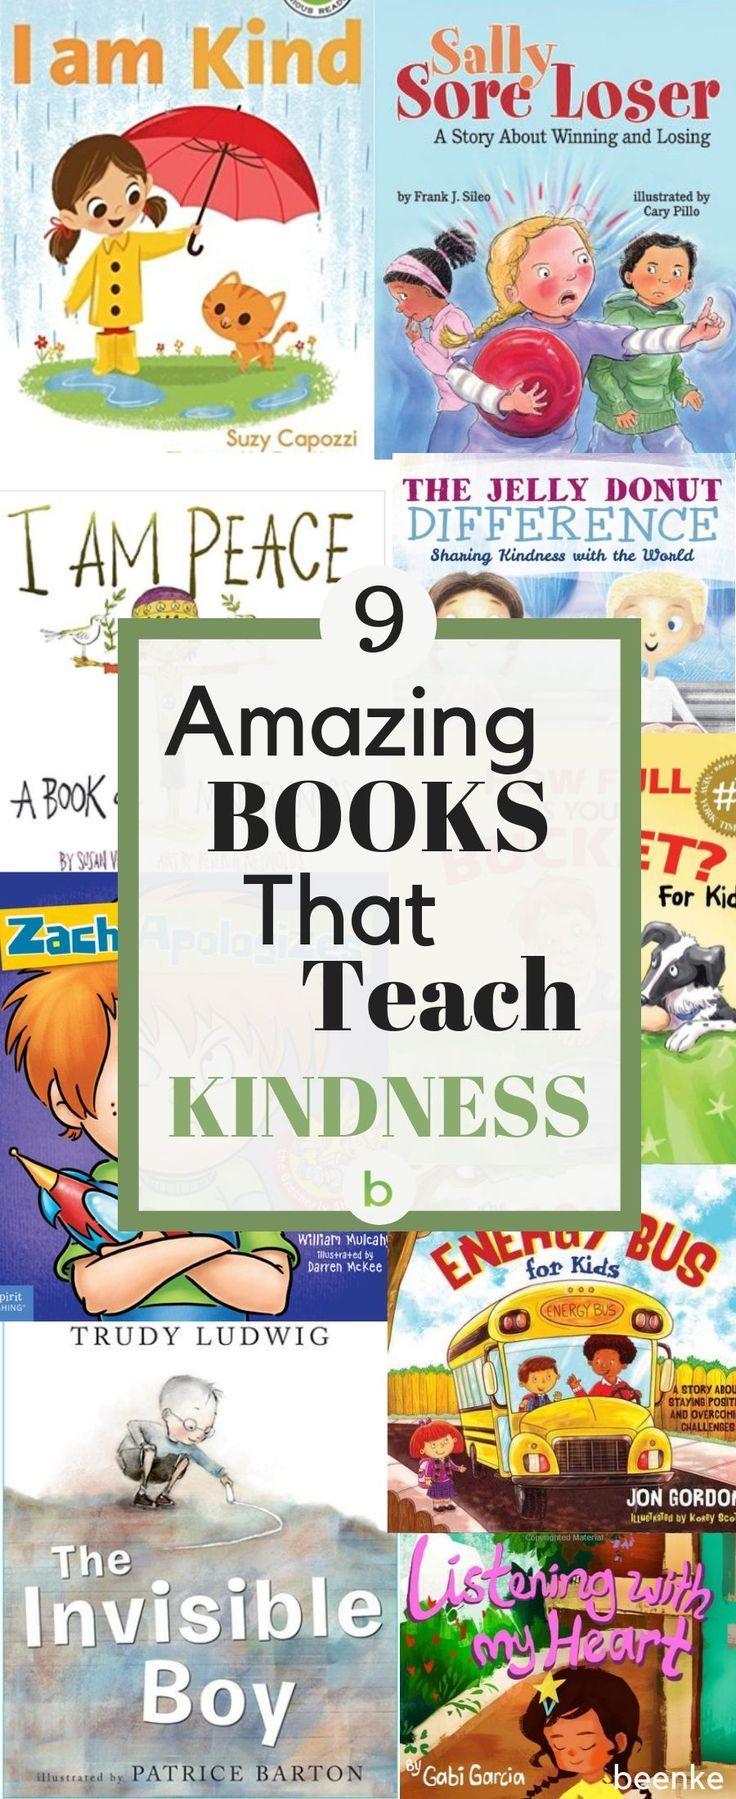 Amazing Books That Teach Kindness To Children